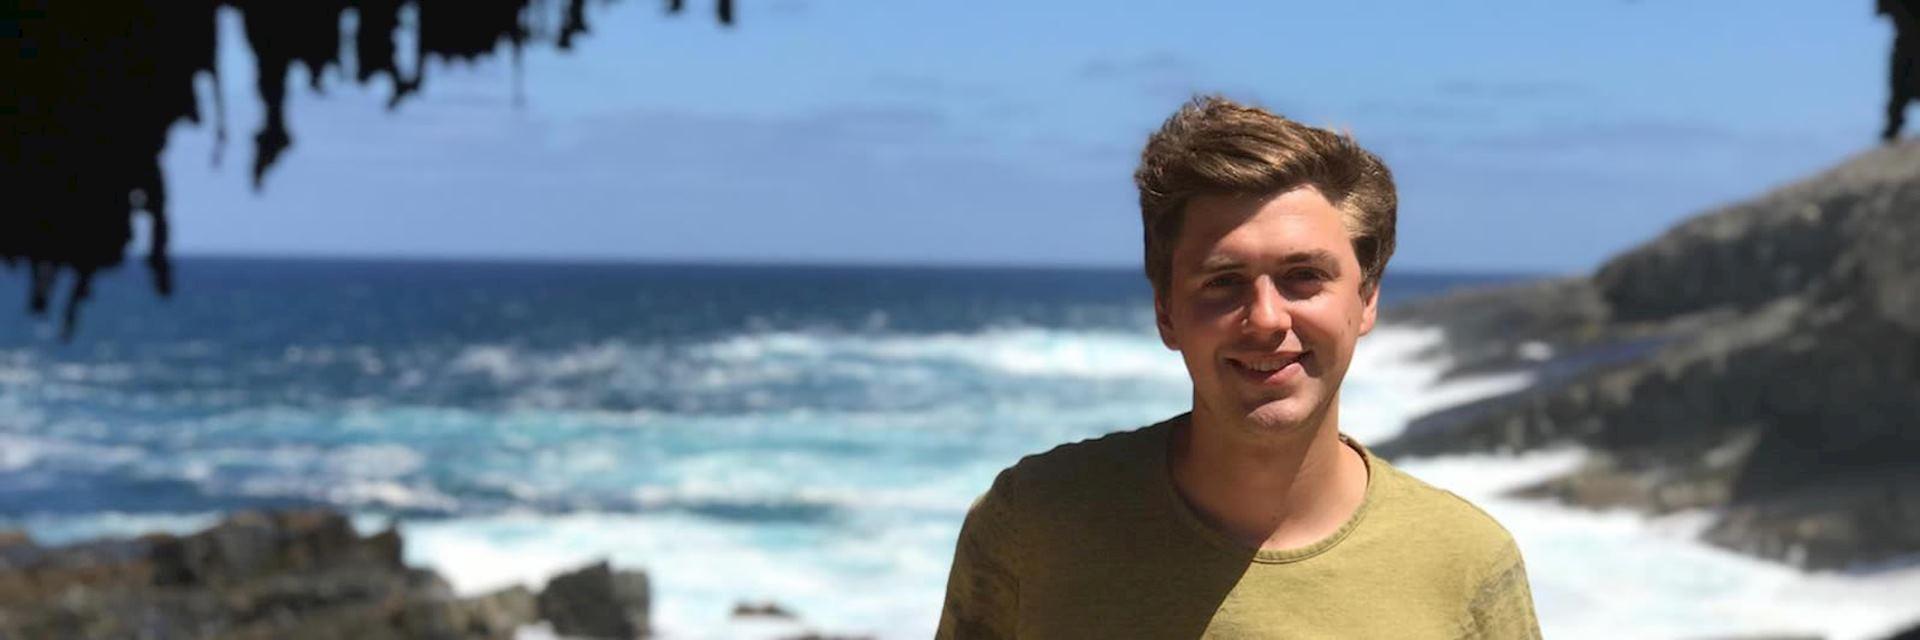 Sean at Admirals Arch, Kangaroo Island